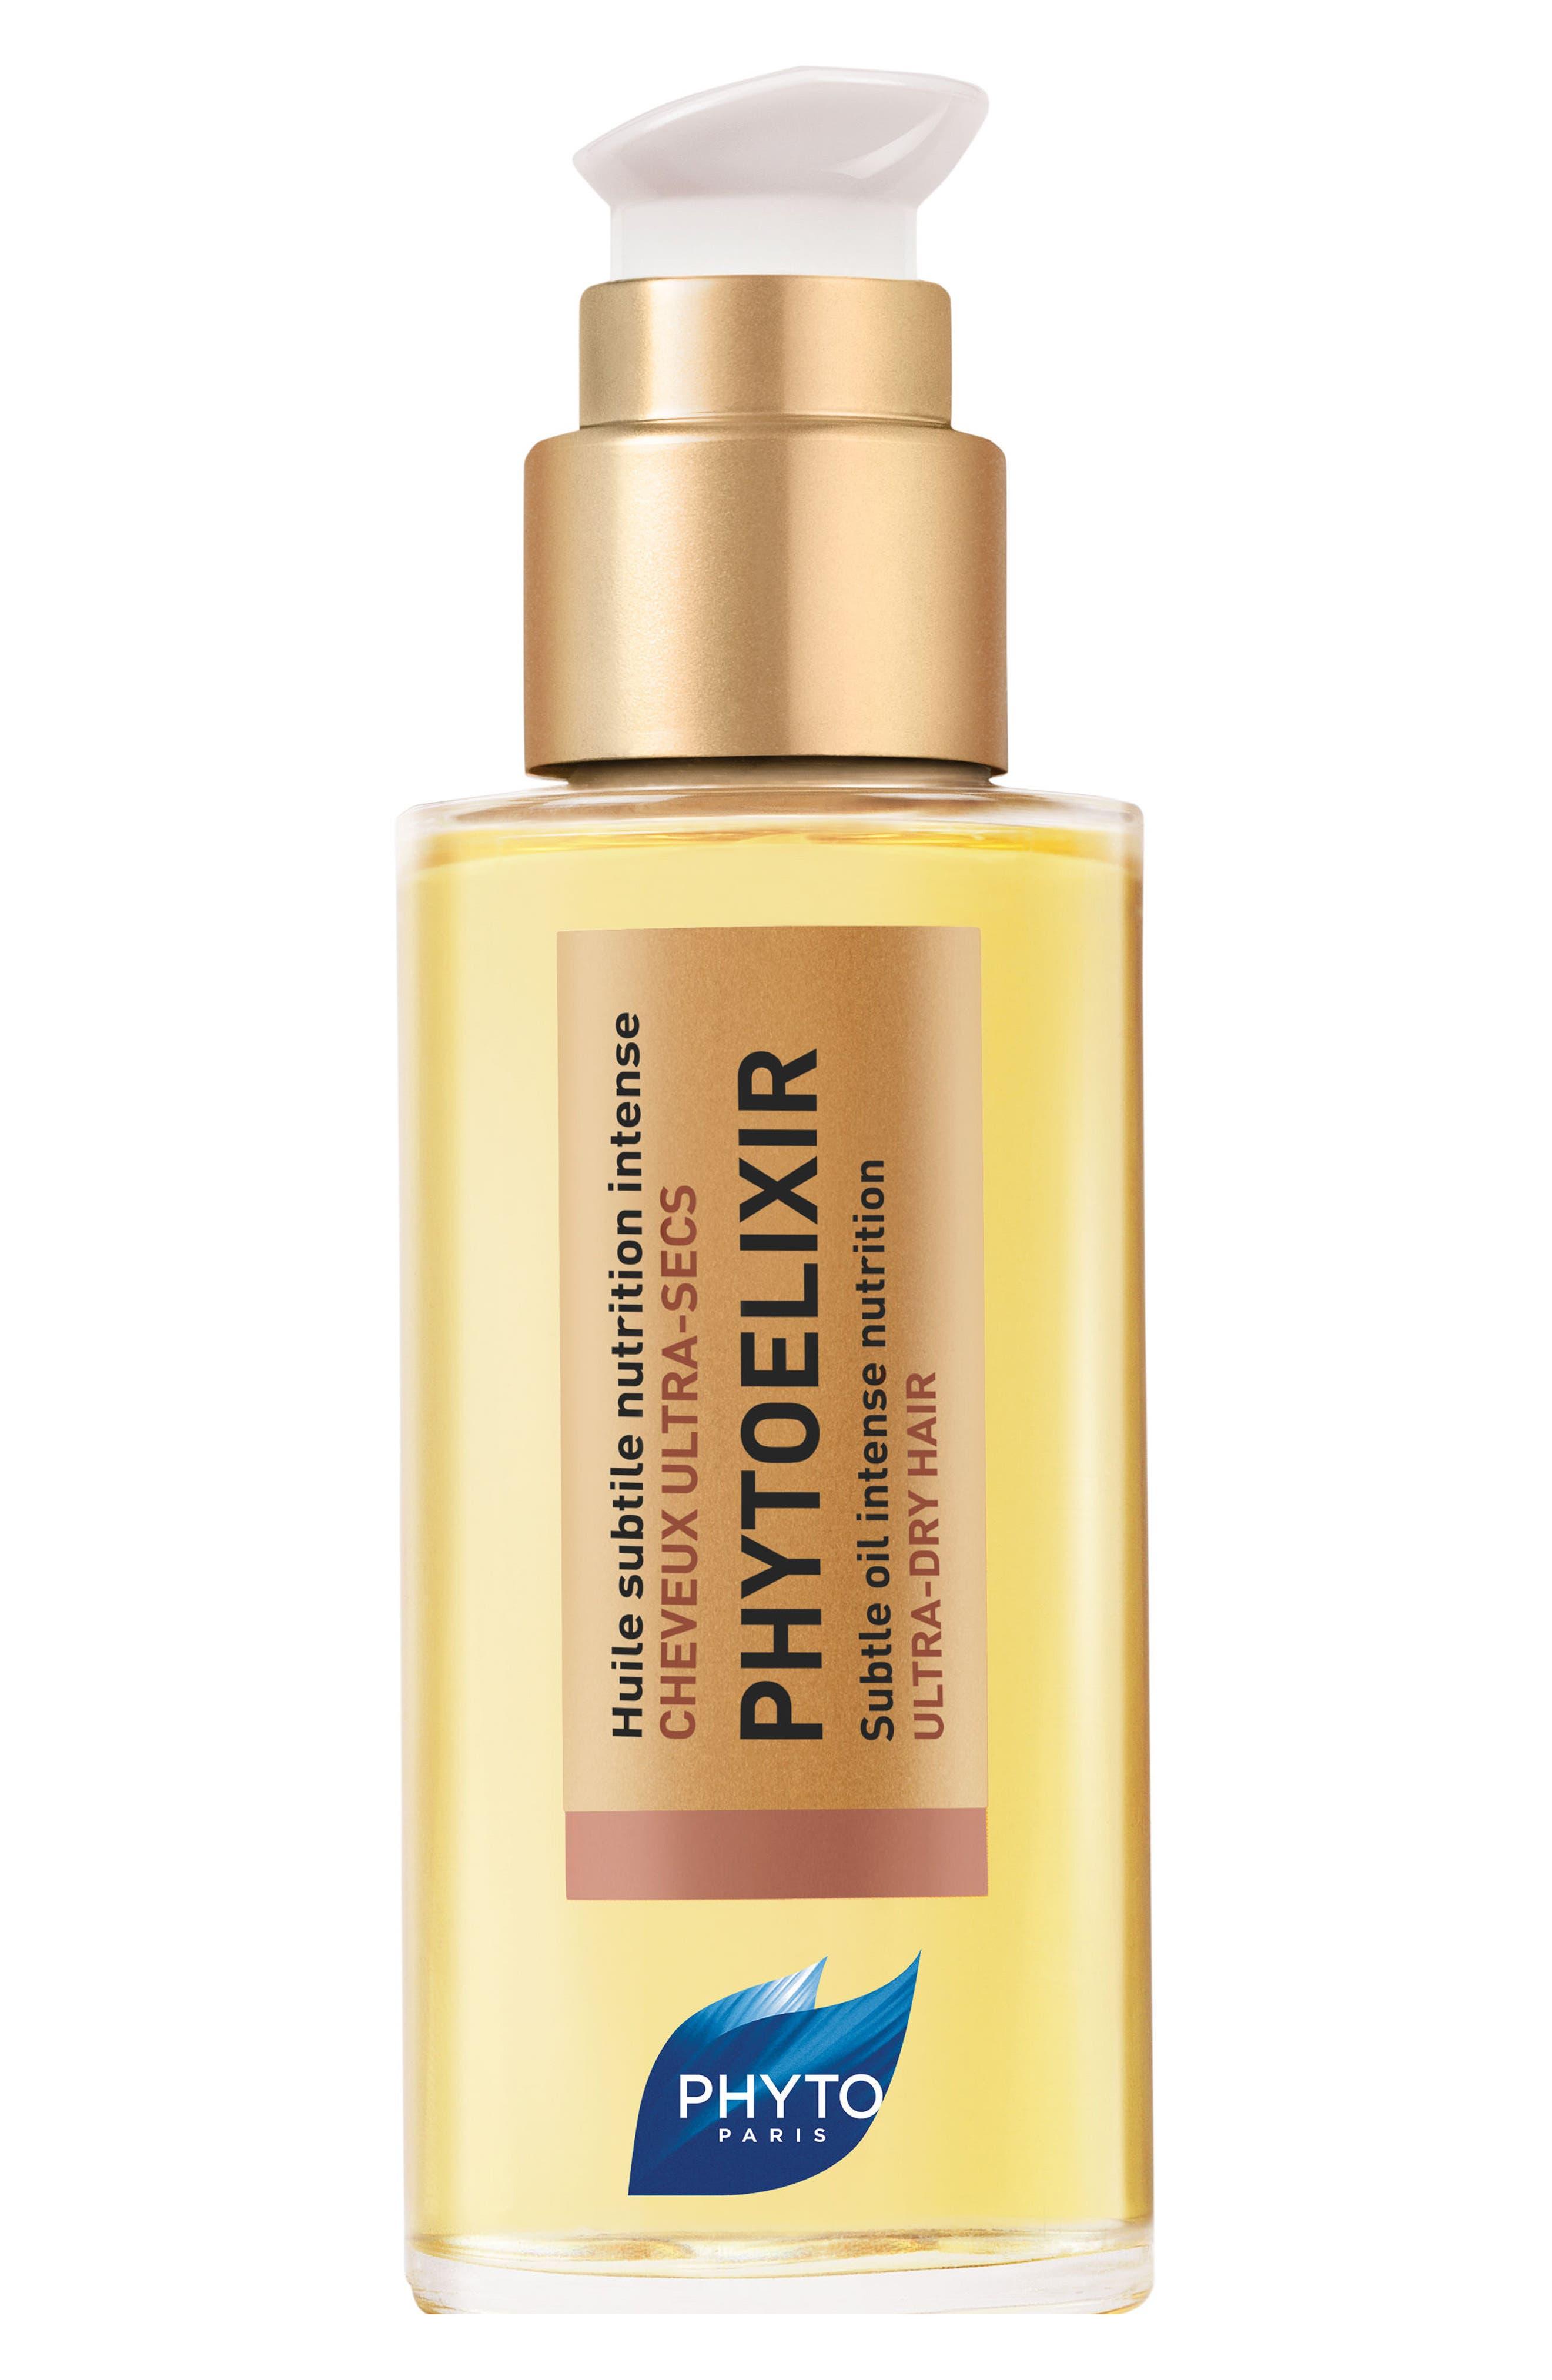 Main Image - PHYTO Phytoelixir Subtle Oil Intense Nutrition